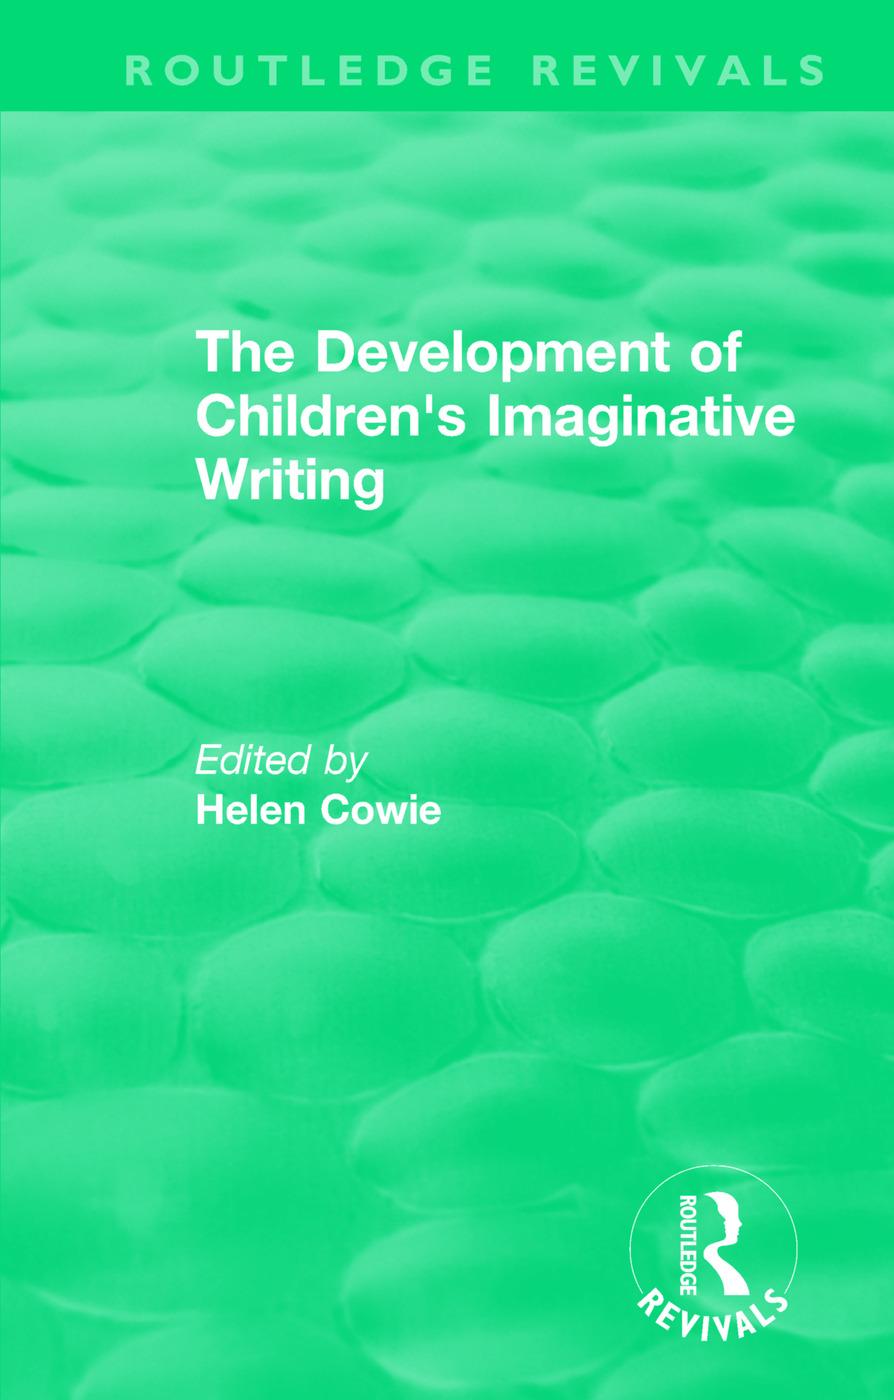 The Development of Children's Imaginative Writing (1984) book cover